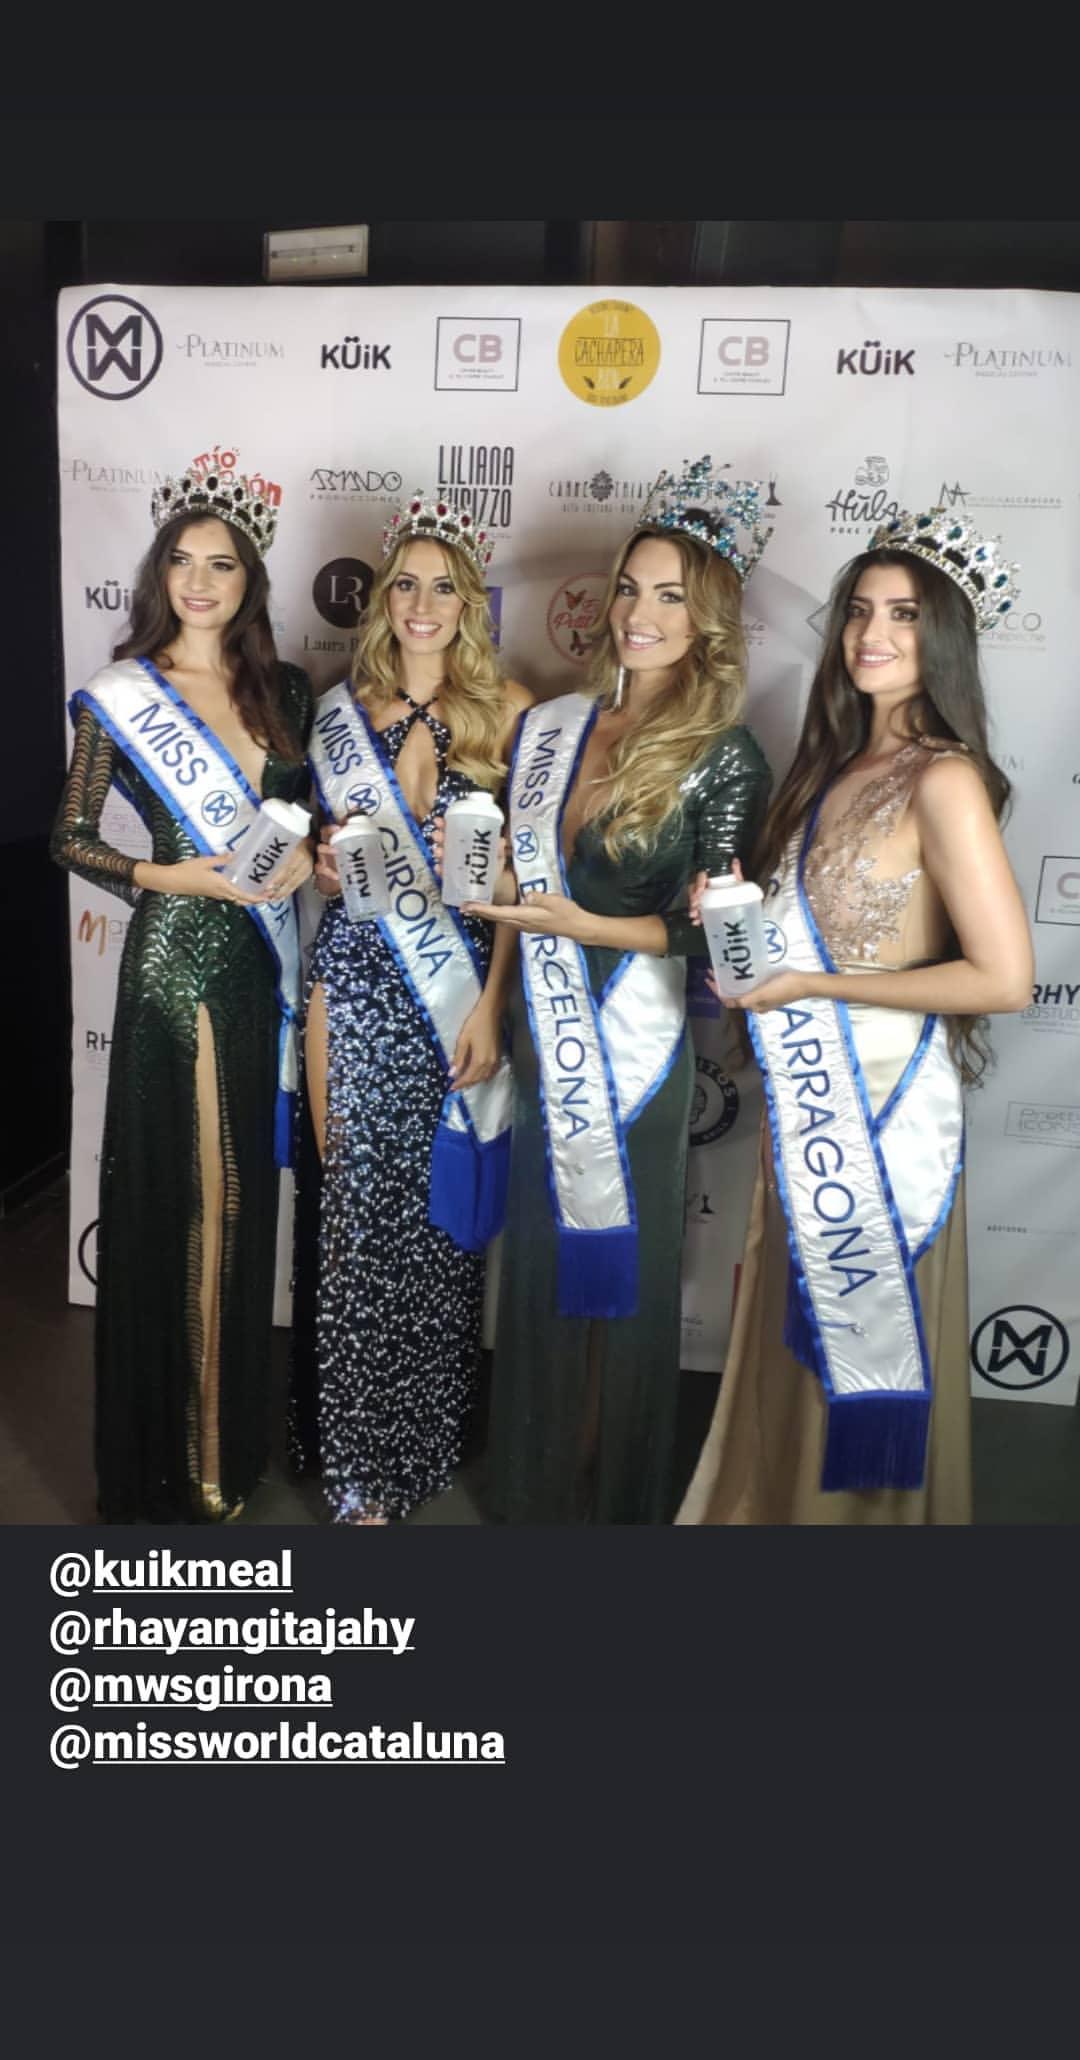 miss world spain 2020, vencedora: almeria. - Página 4 Insta-Stories-CCjfyj-Fi6-Mm